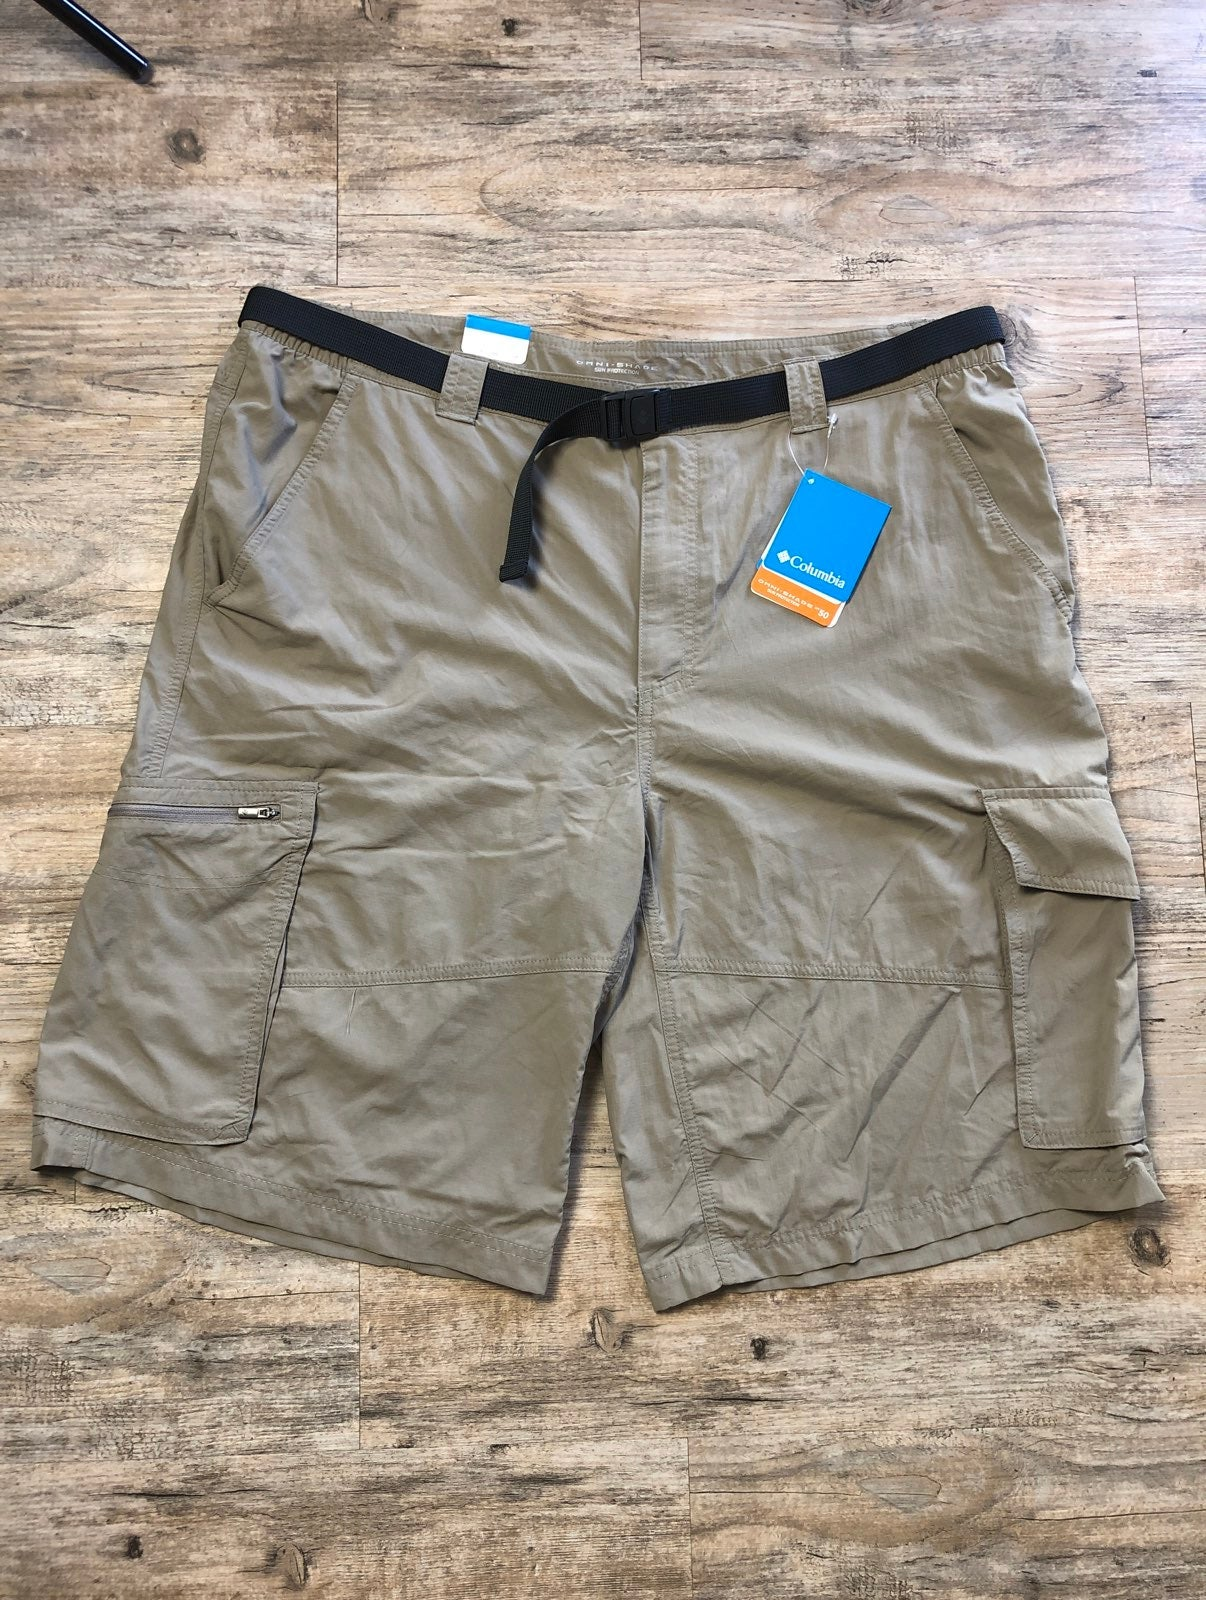 Columbia Khaki Omni Shade Cargo Shorts 12 inch inseam Size 32  34 or 42  NWT